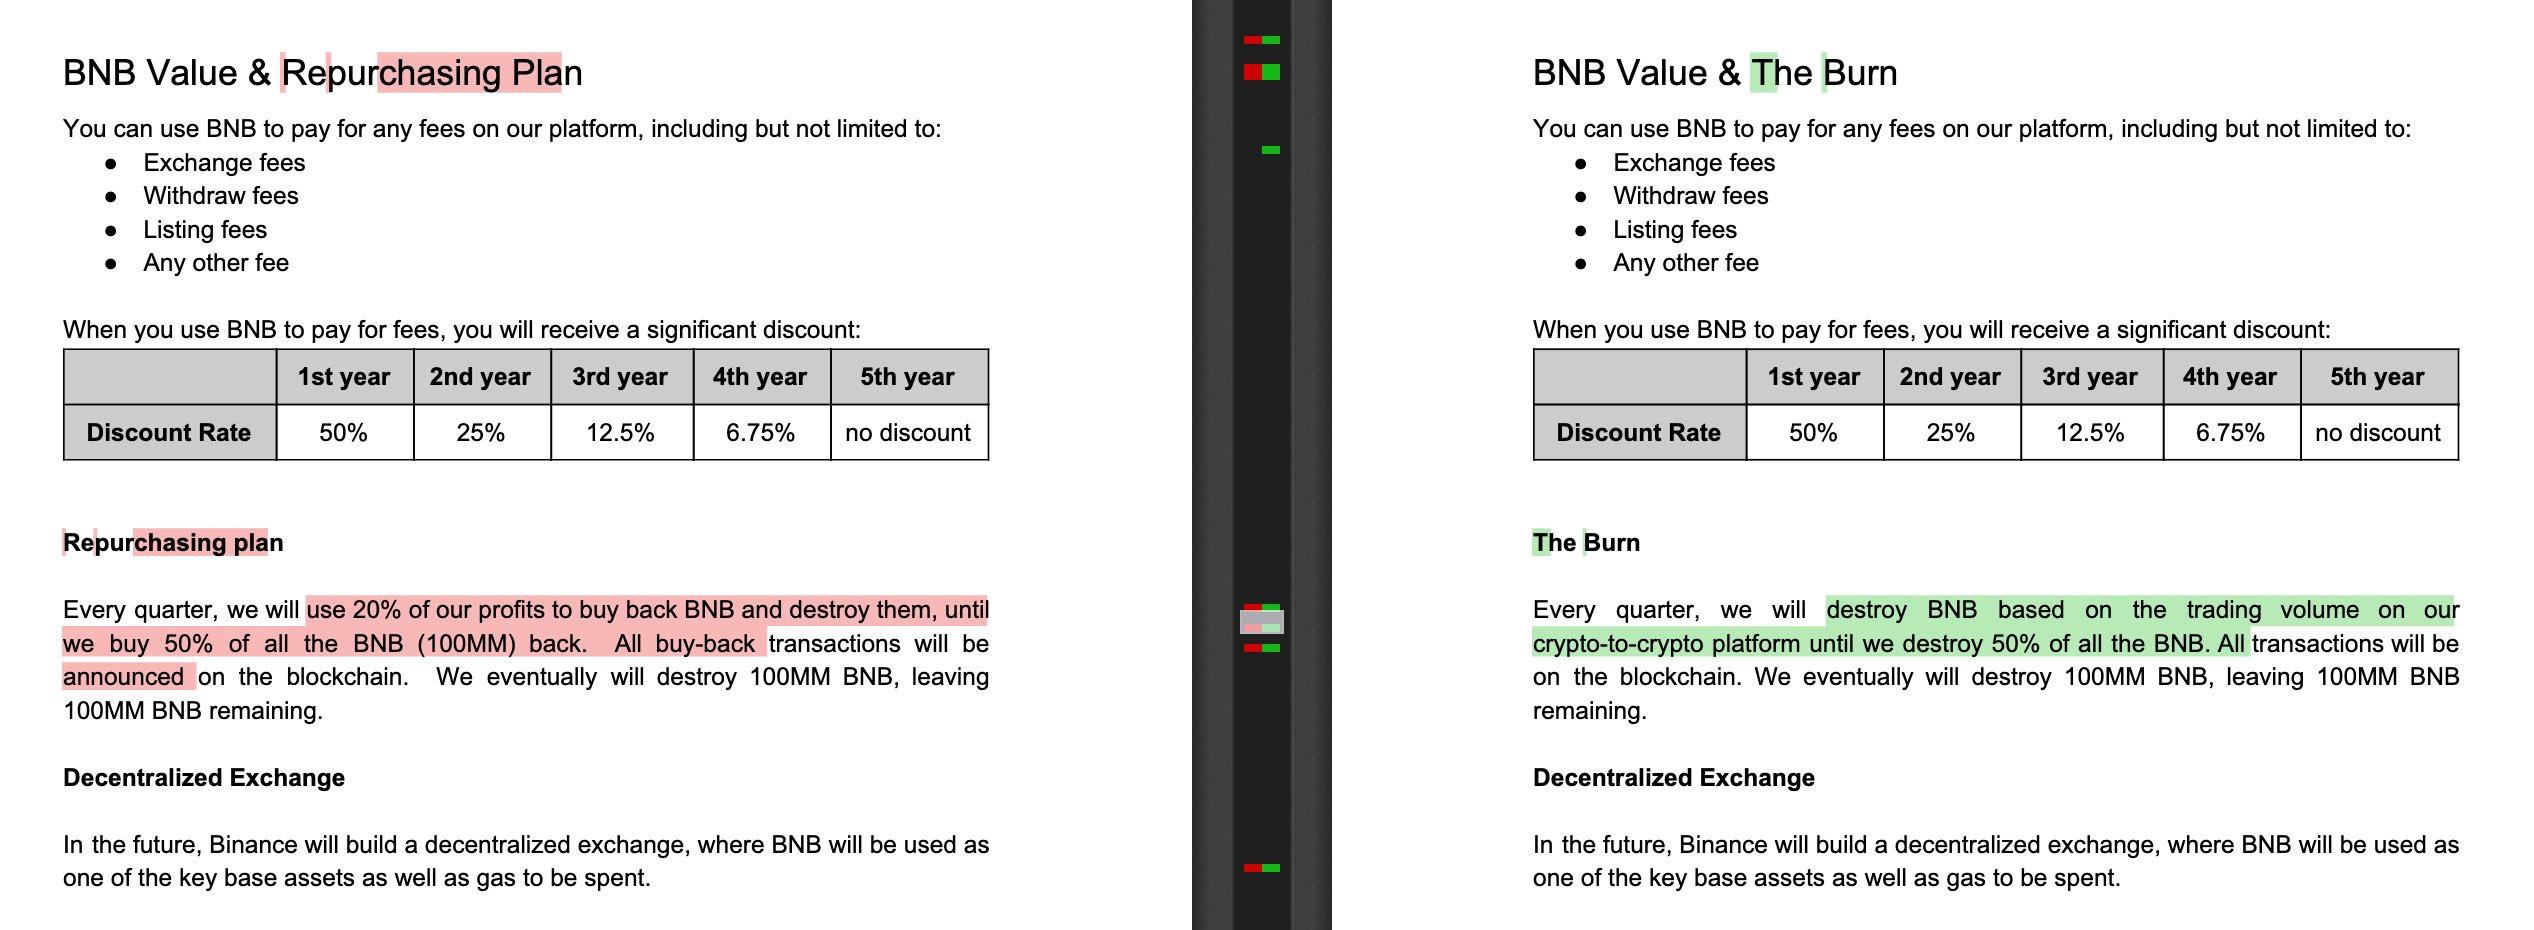 BNB whitepaper